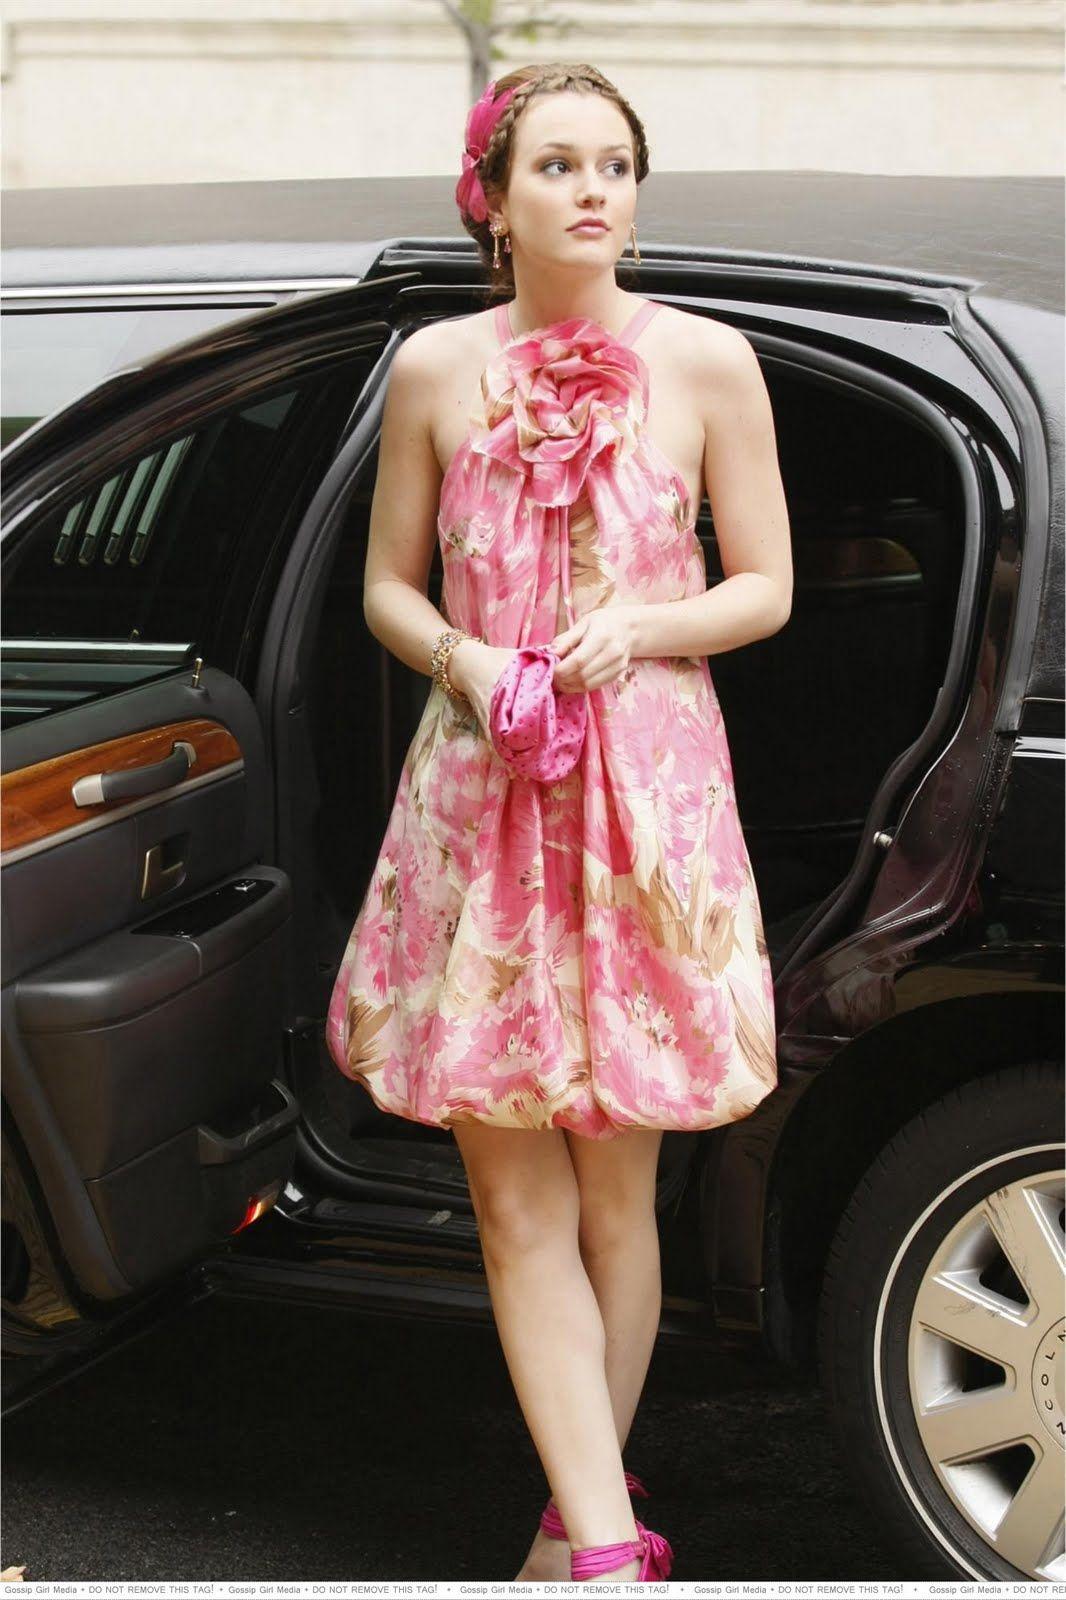 Leighton Meester as Blair Waldorf in Gossip Girl; love this dress